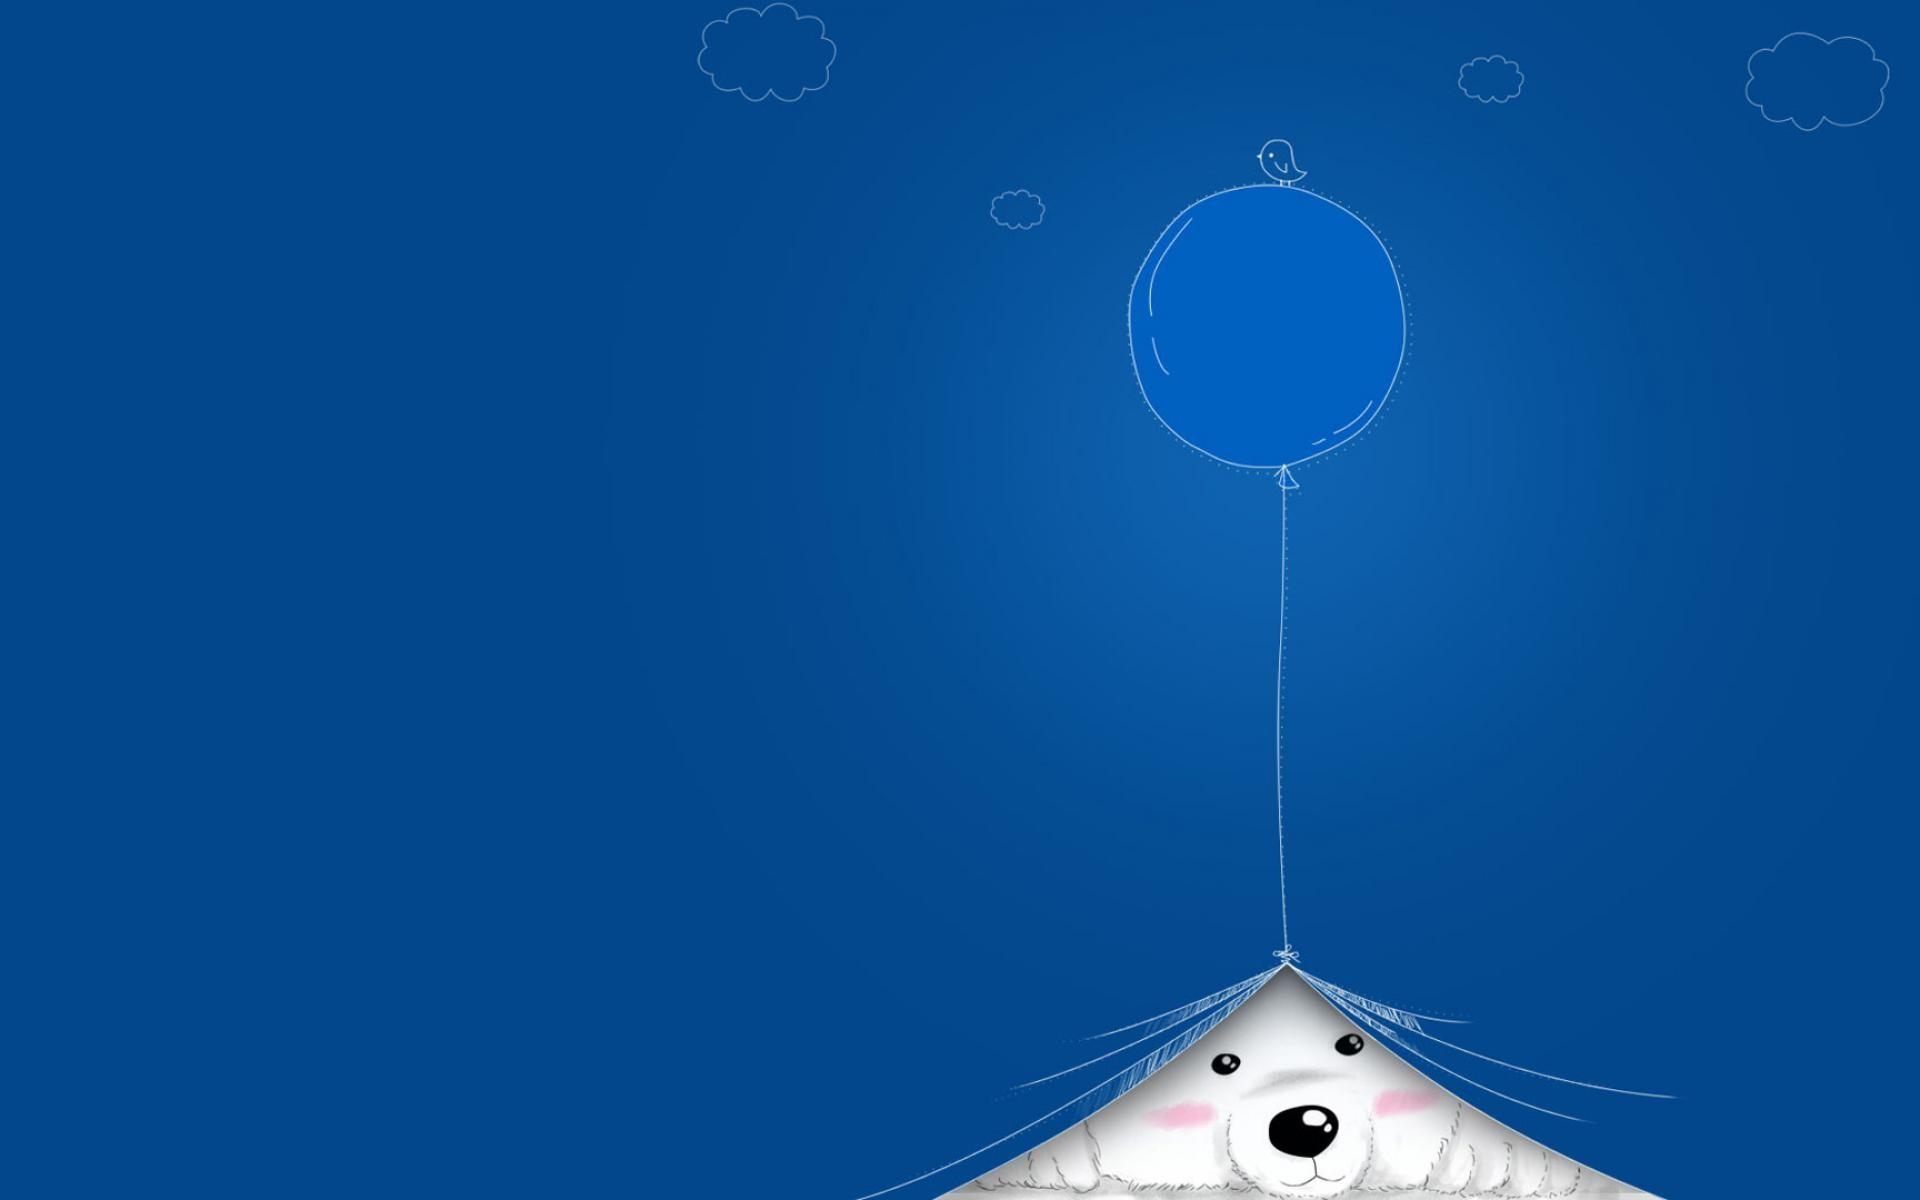 Wallpapers For > Cute Light Blue Wallpaper